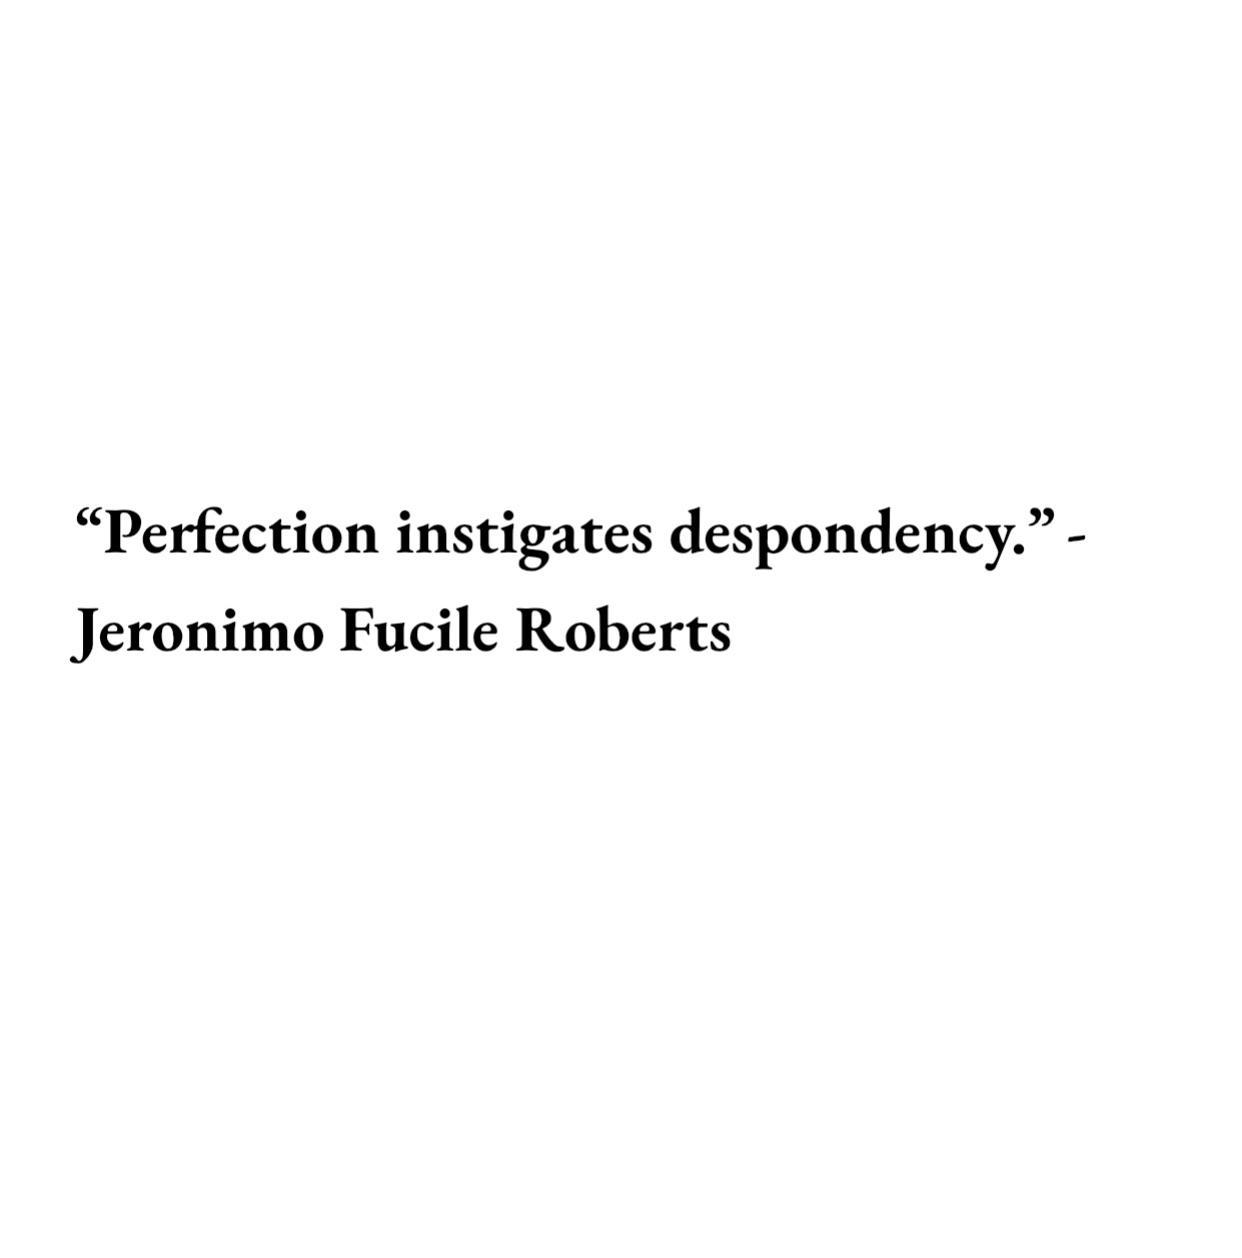 """Perfection instigates despondency."" — Jeronimo https://inspirational.ly"